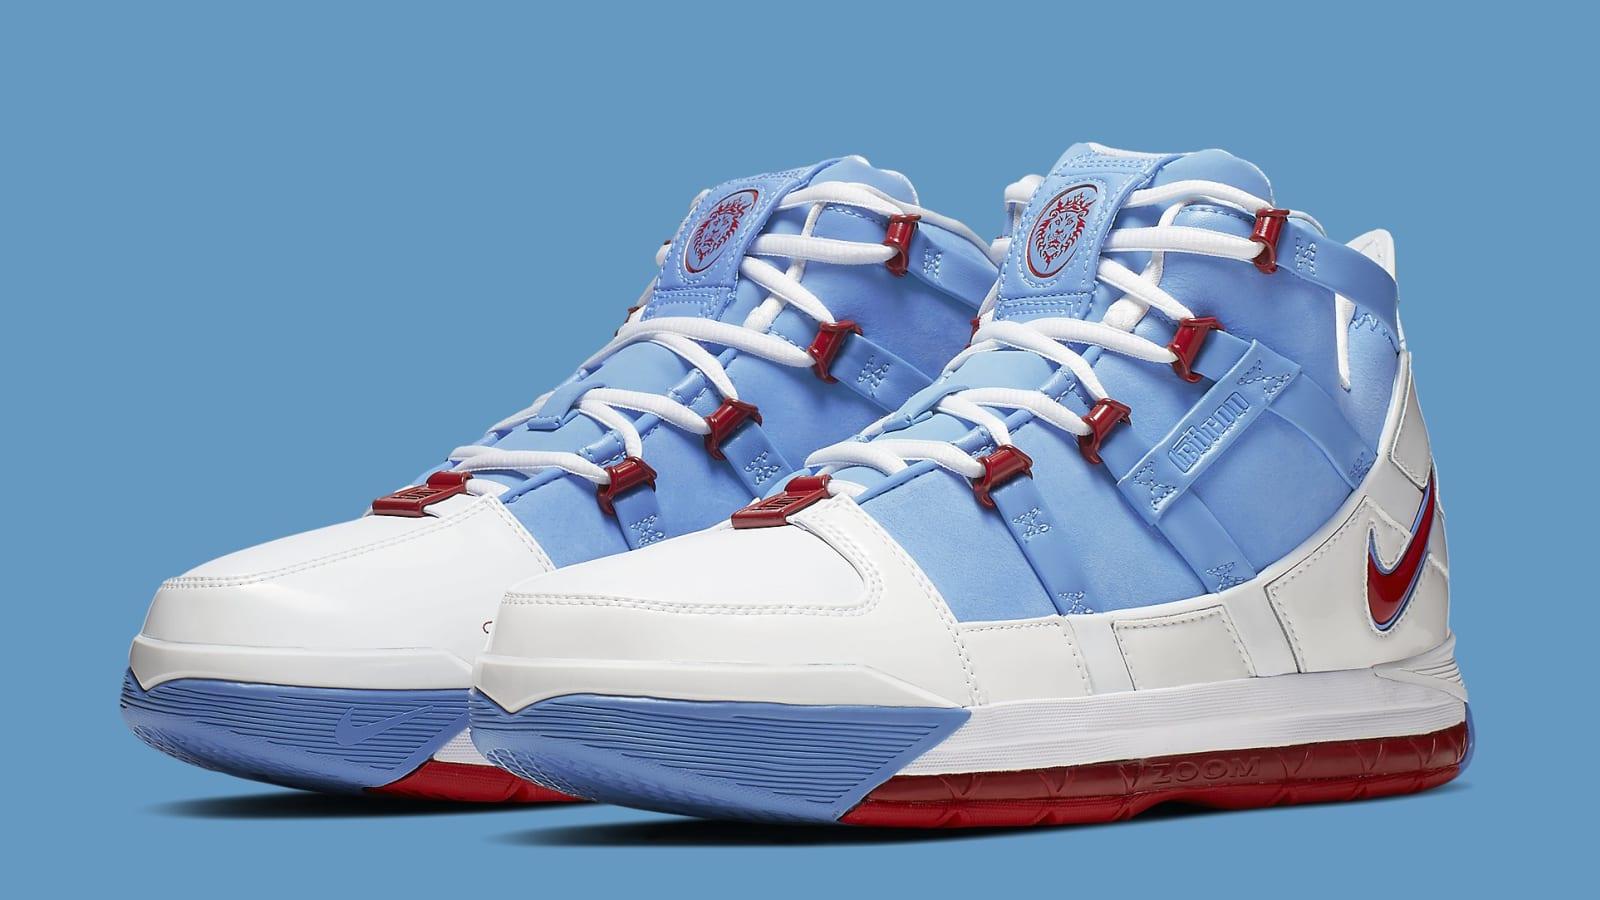 012b387cfa9 Nike LeBron 3 QS 'Houston All-Star' AO2434-400 Release Date | Sole ...